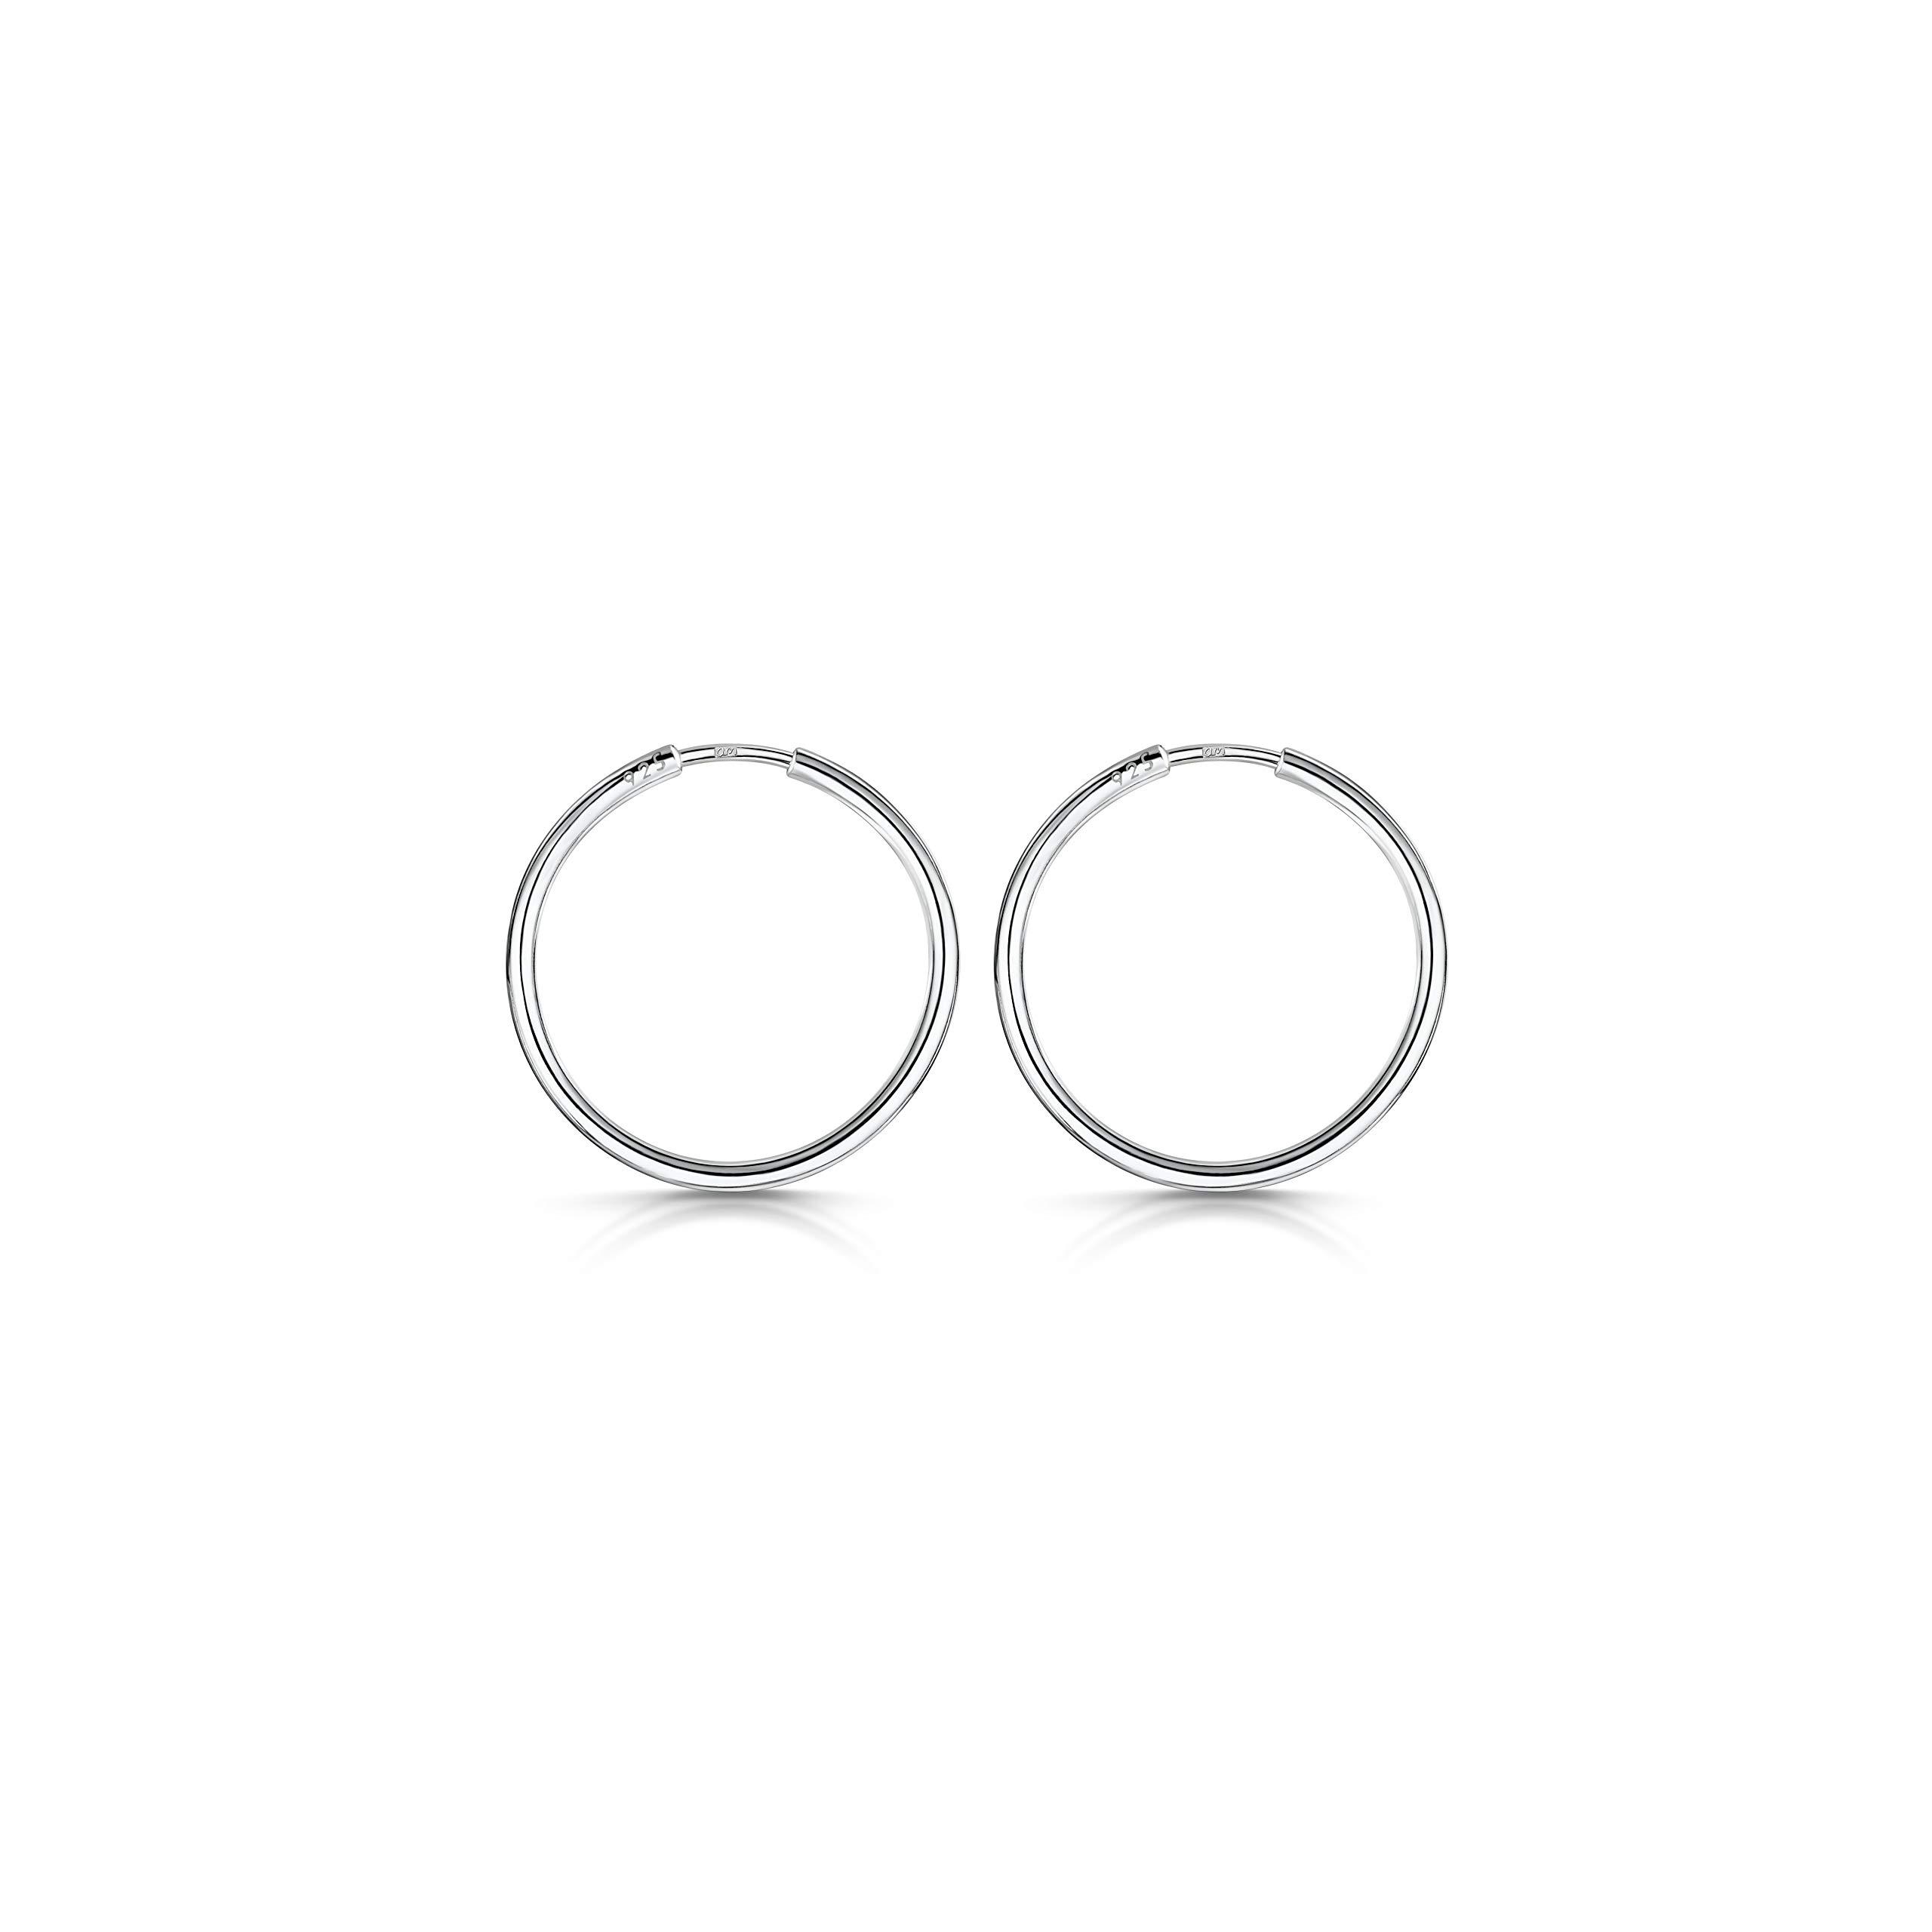 ENDLESS HOOP ROUND .925 Sterling Silver EARRINGS 1.2mm Thick 65mm Diameter